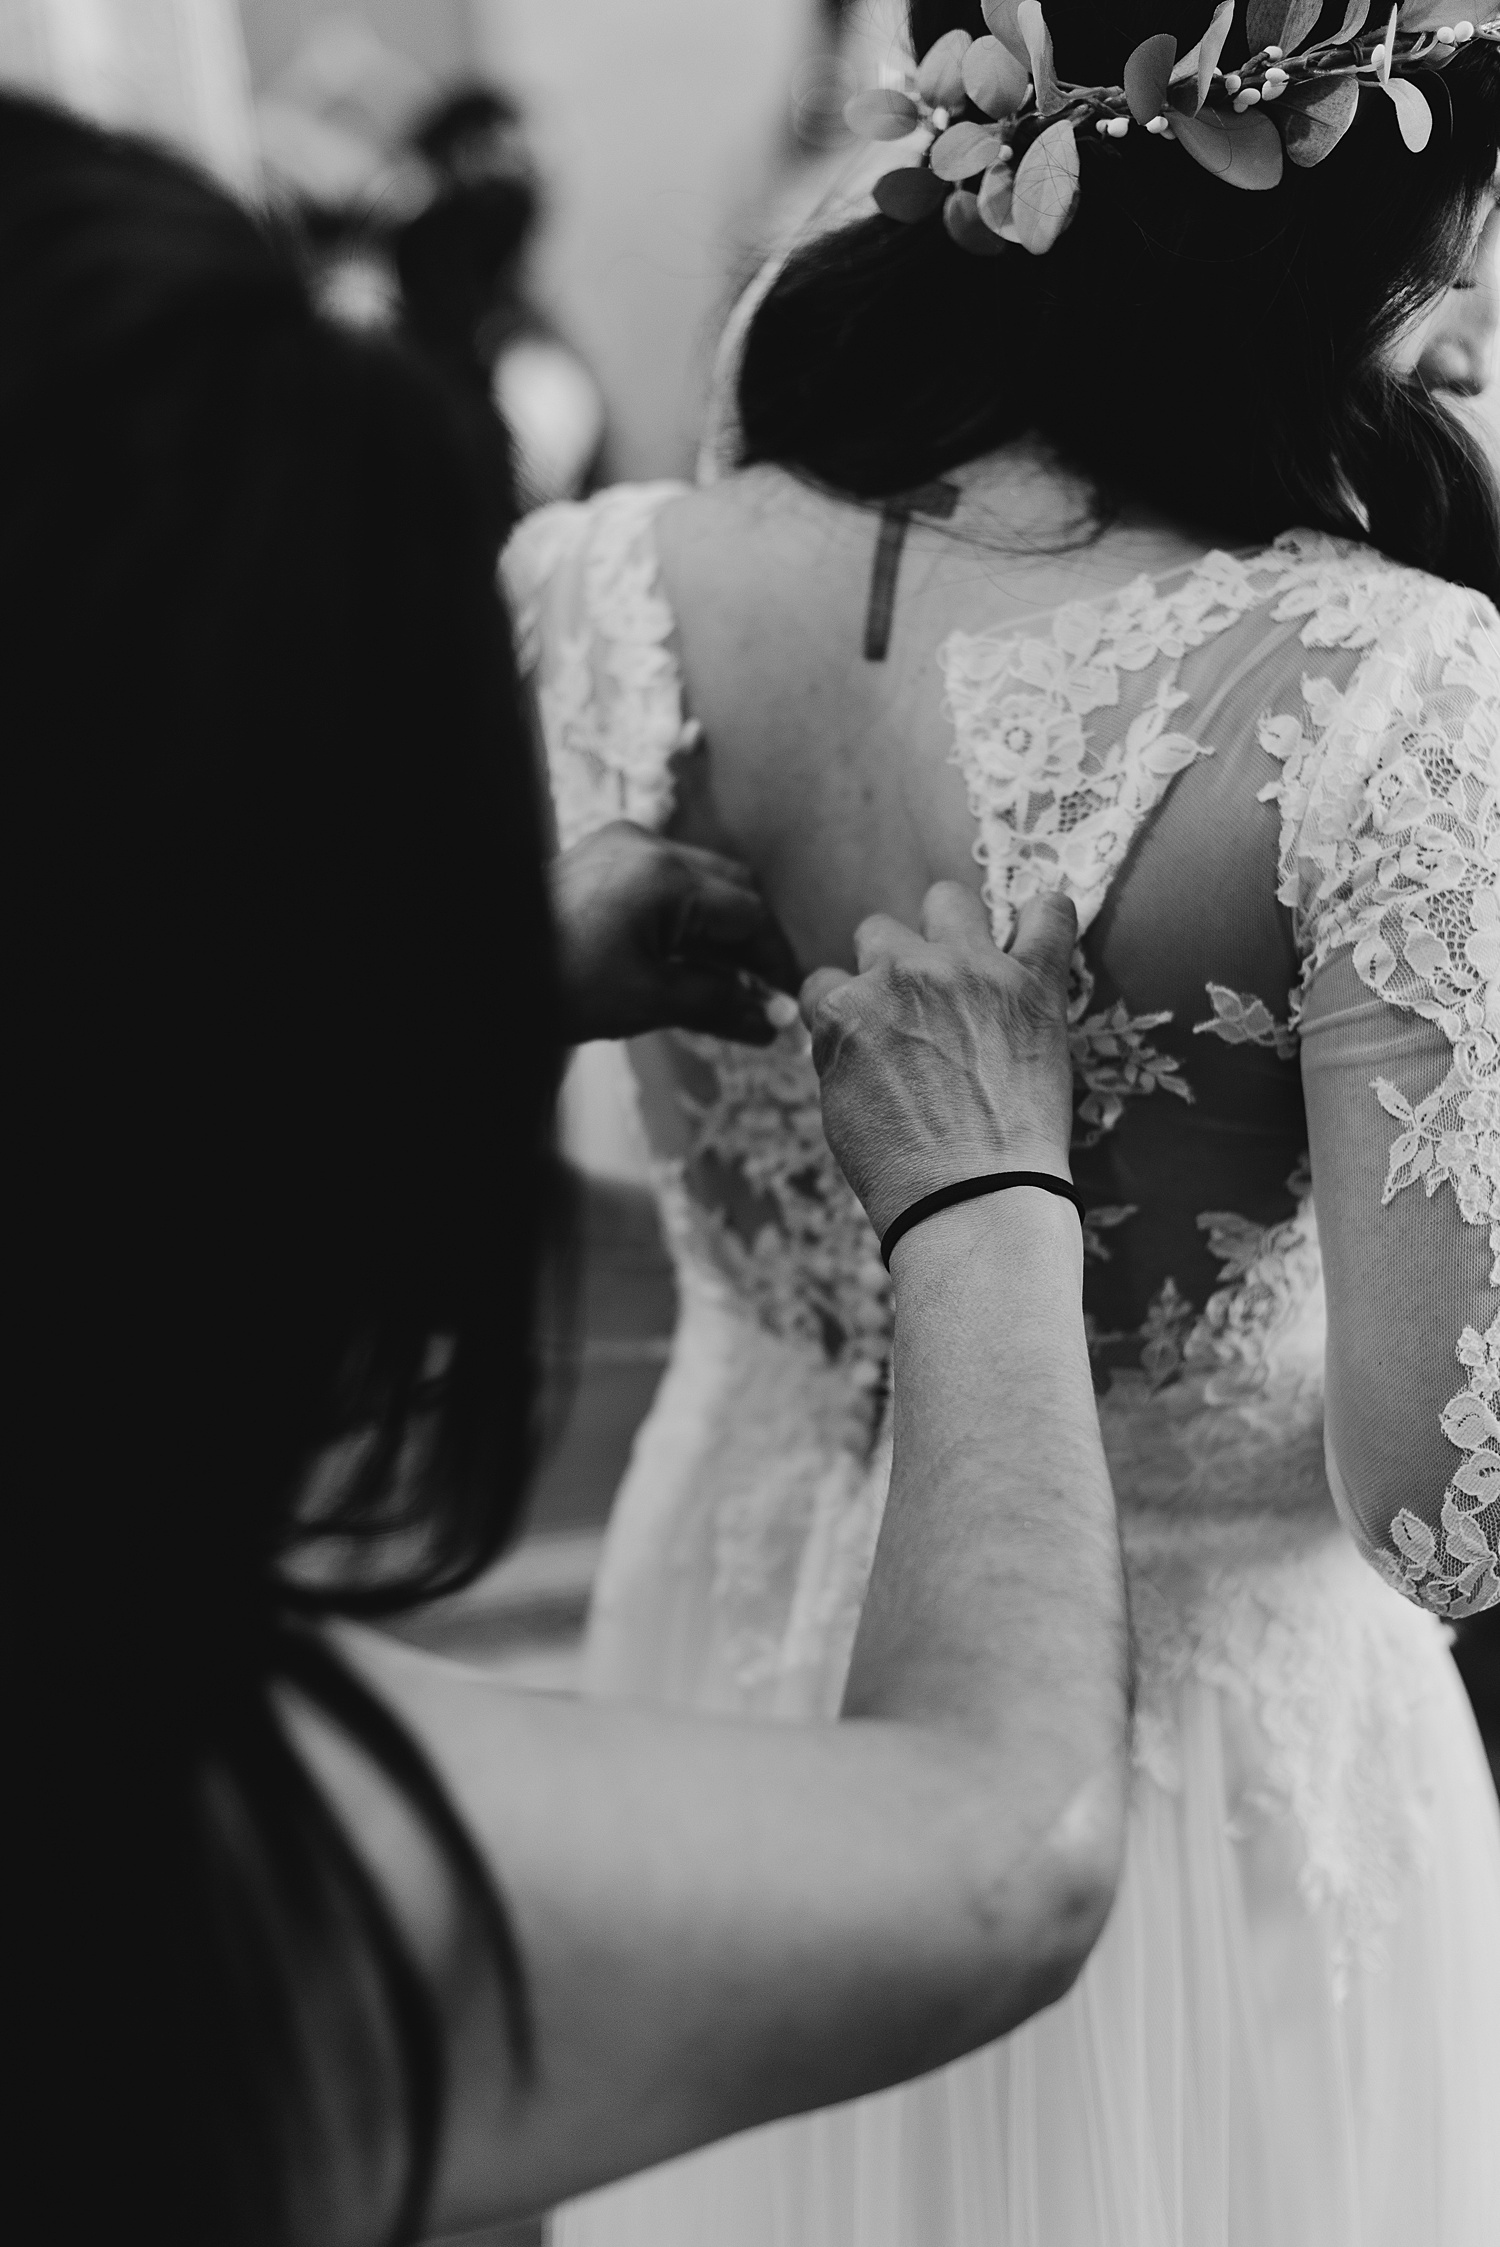 Zandra Barriga Photo - Darian and Colton Wedding_0001.jpg